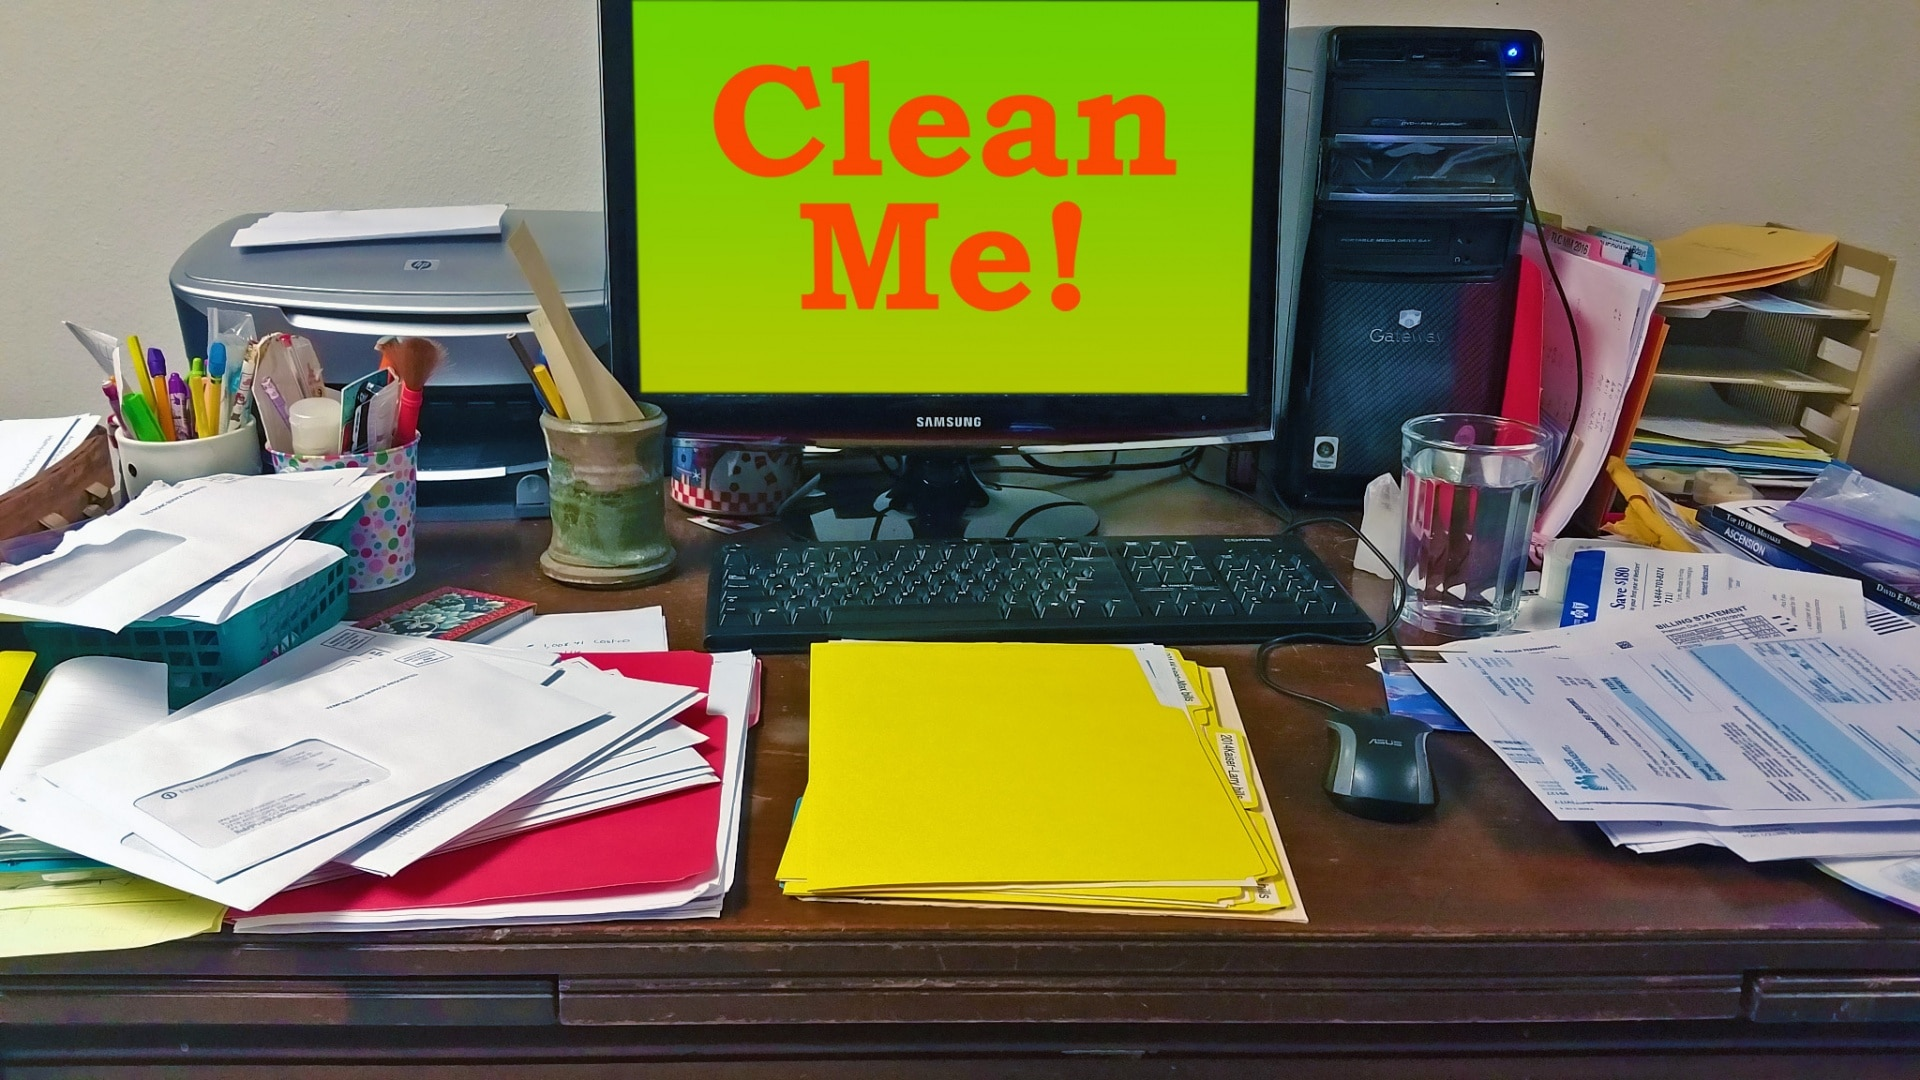 messy-desk-clean-me